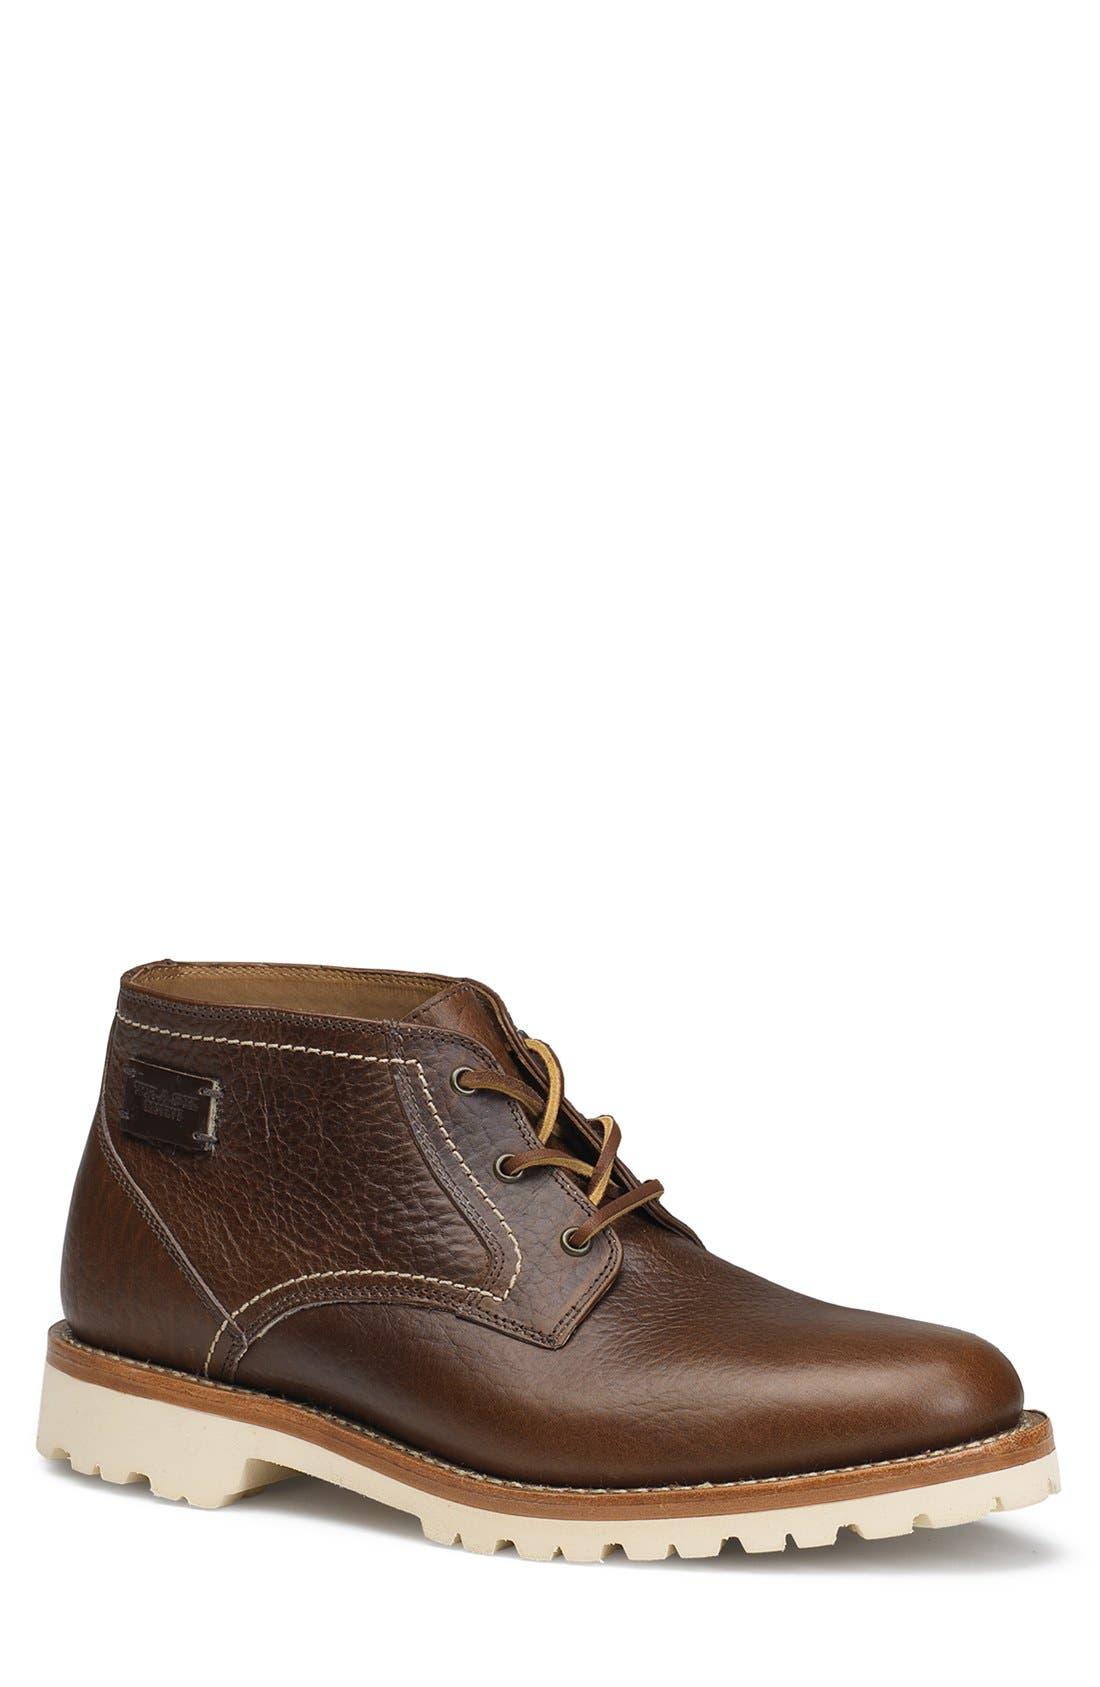 Trask 'Bighorn' Plain Toe Boot (Men)